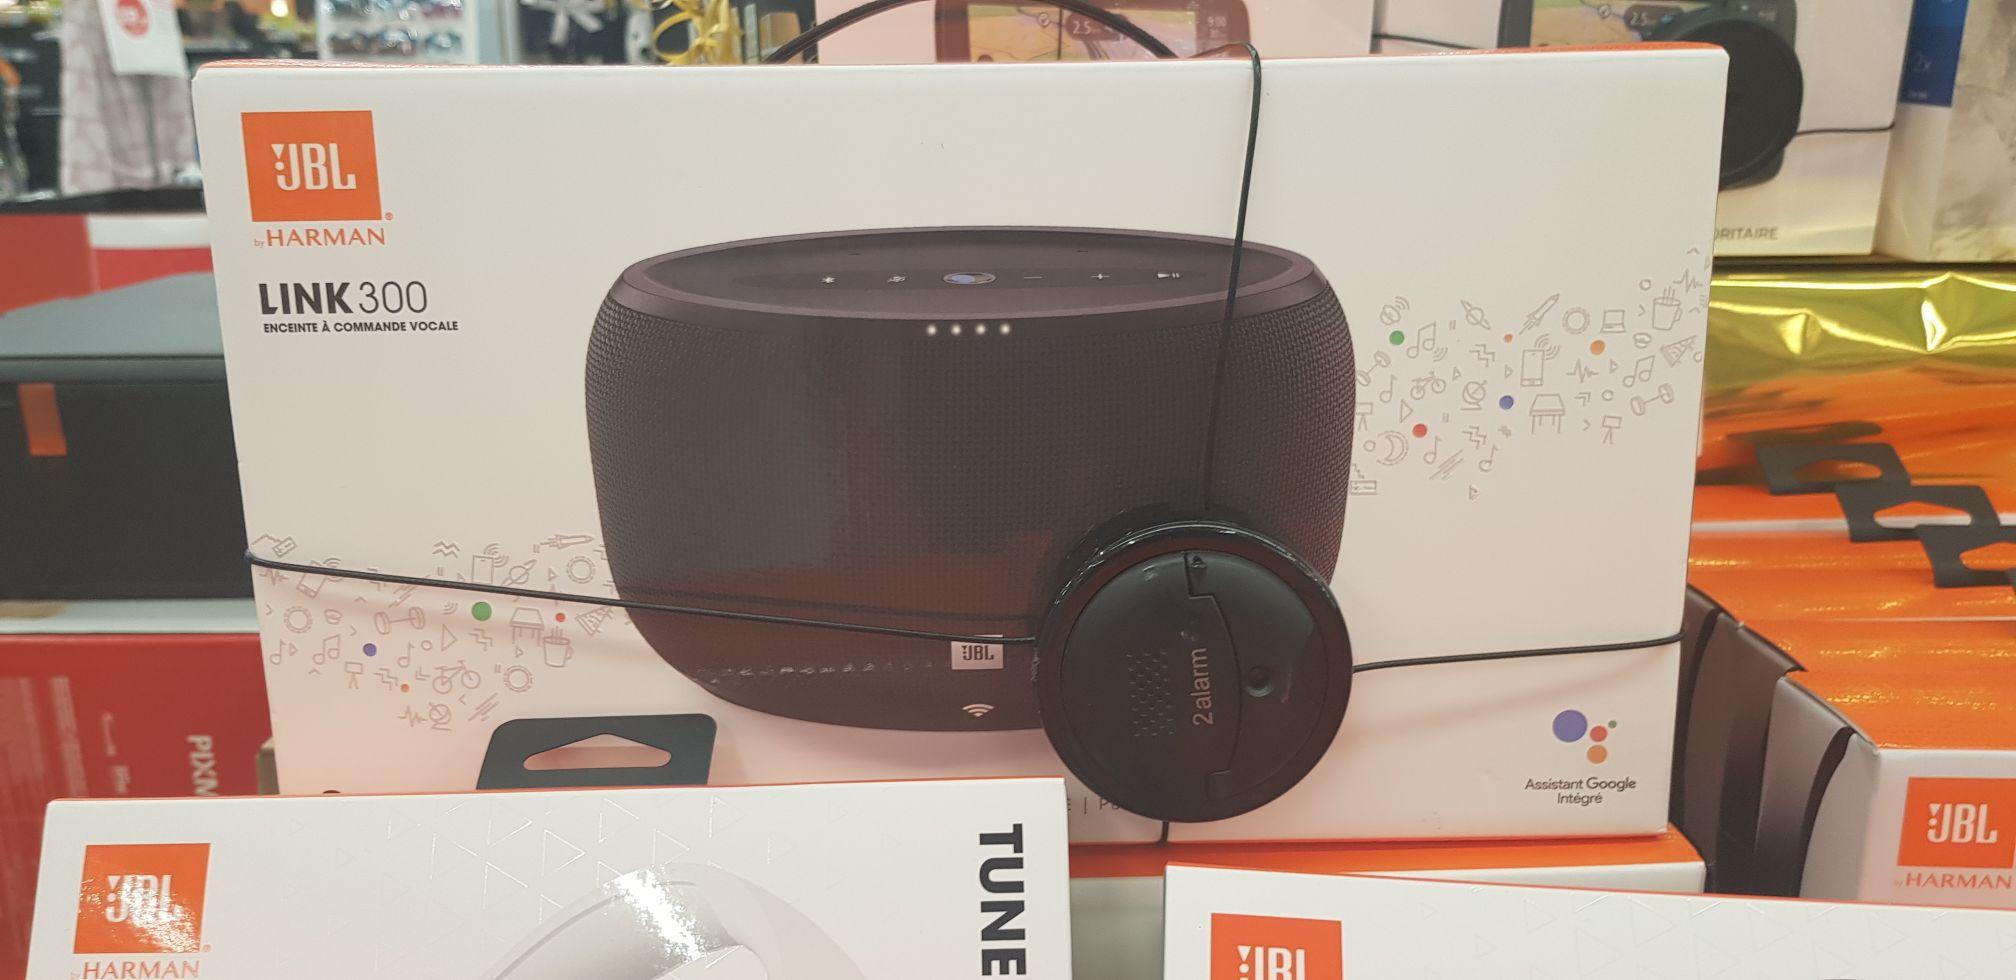 Enceinte bluetooth sans-fil avec assistant vocal JBL LINK300 - Google Home - Josselin (56)